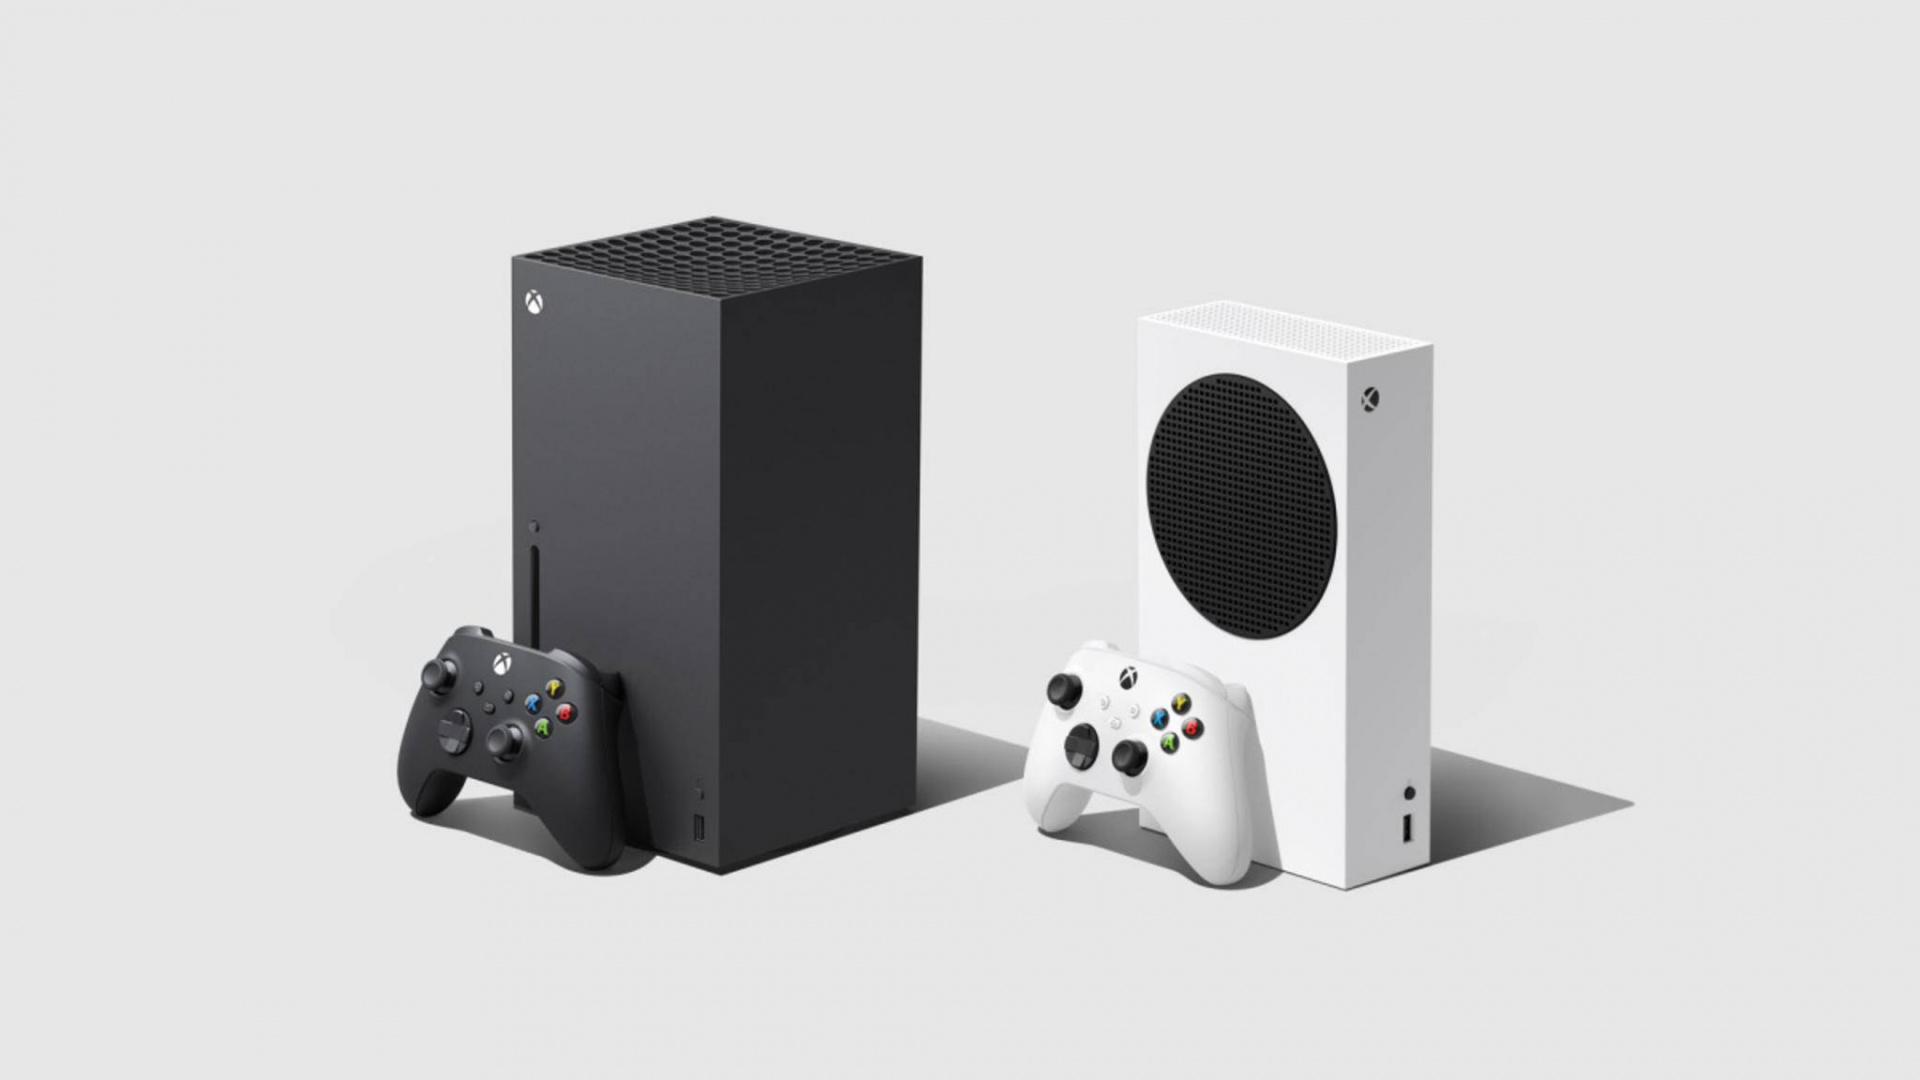 В России стартуют предзаказы Xbox Series S и Xbox Series X